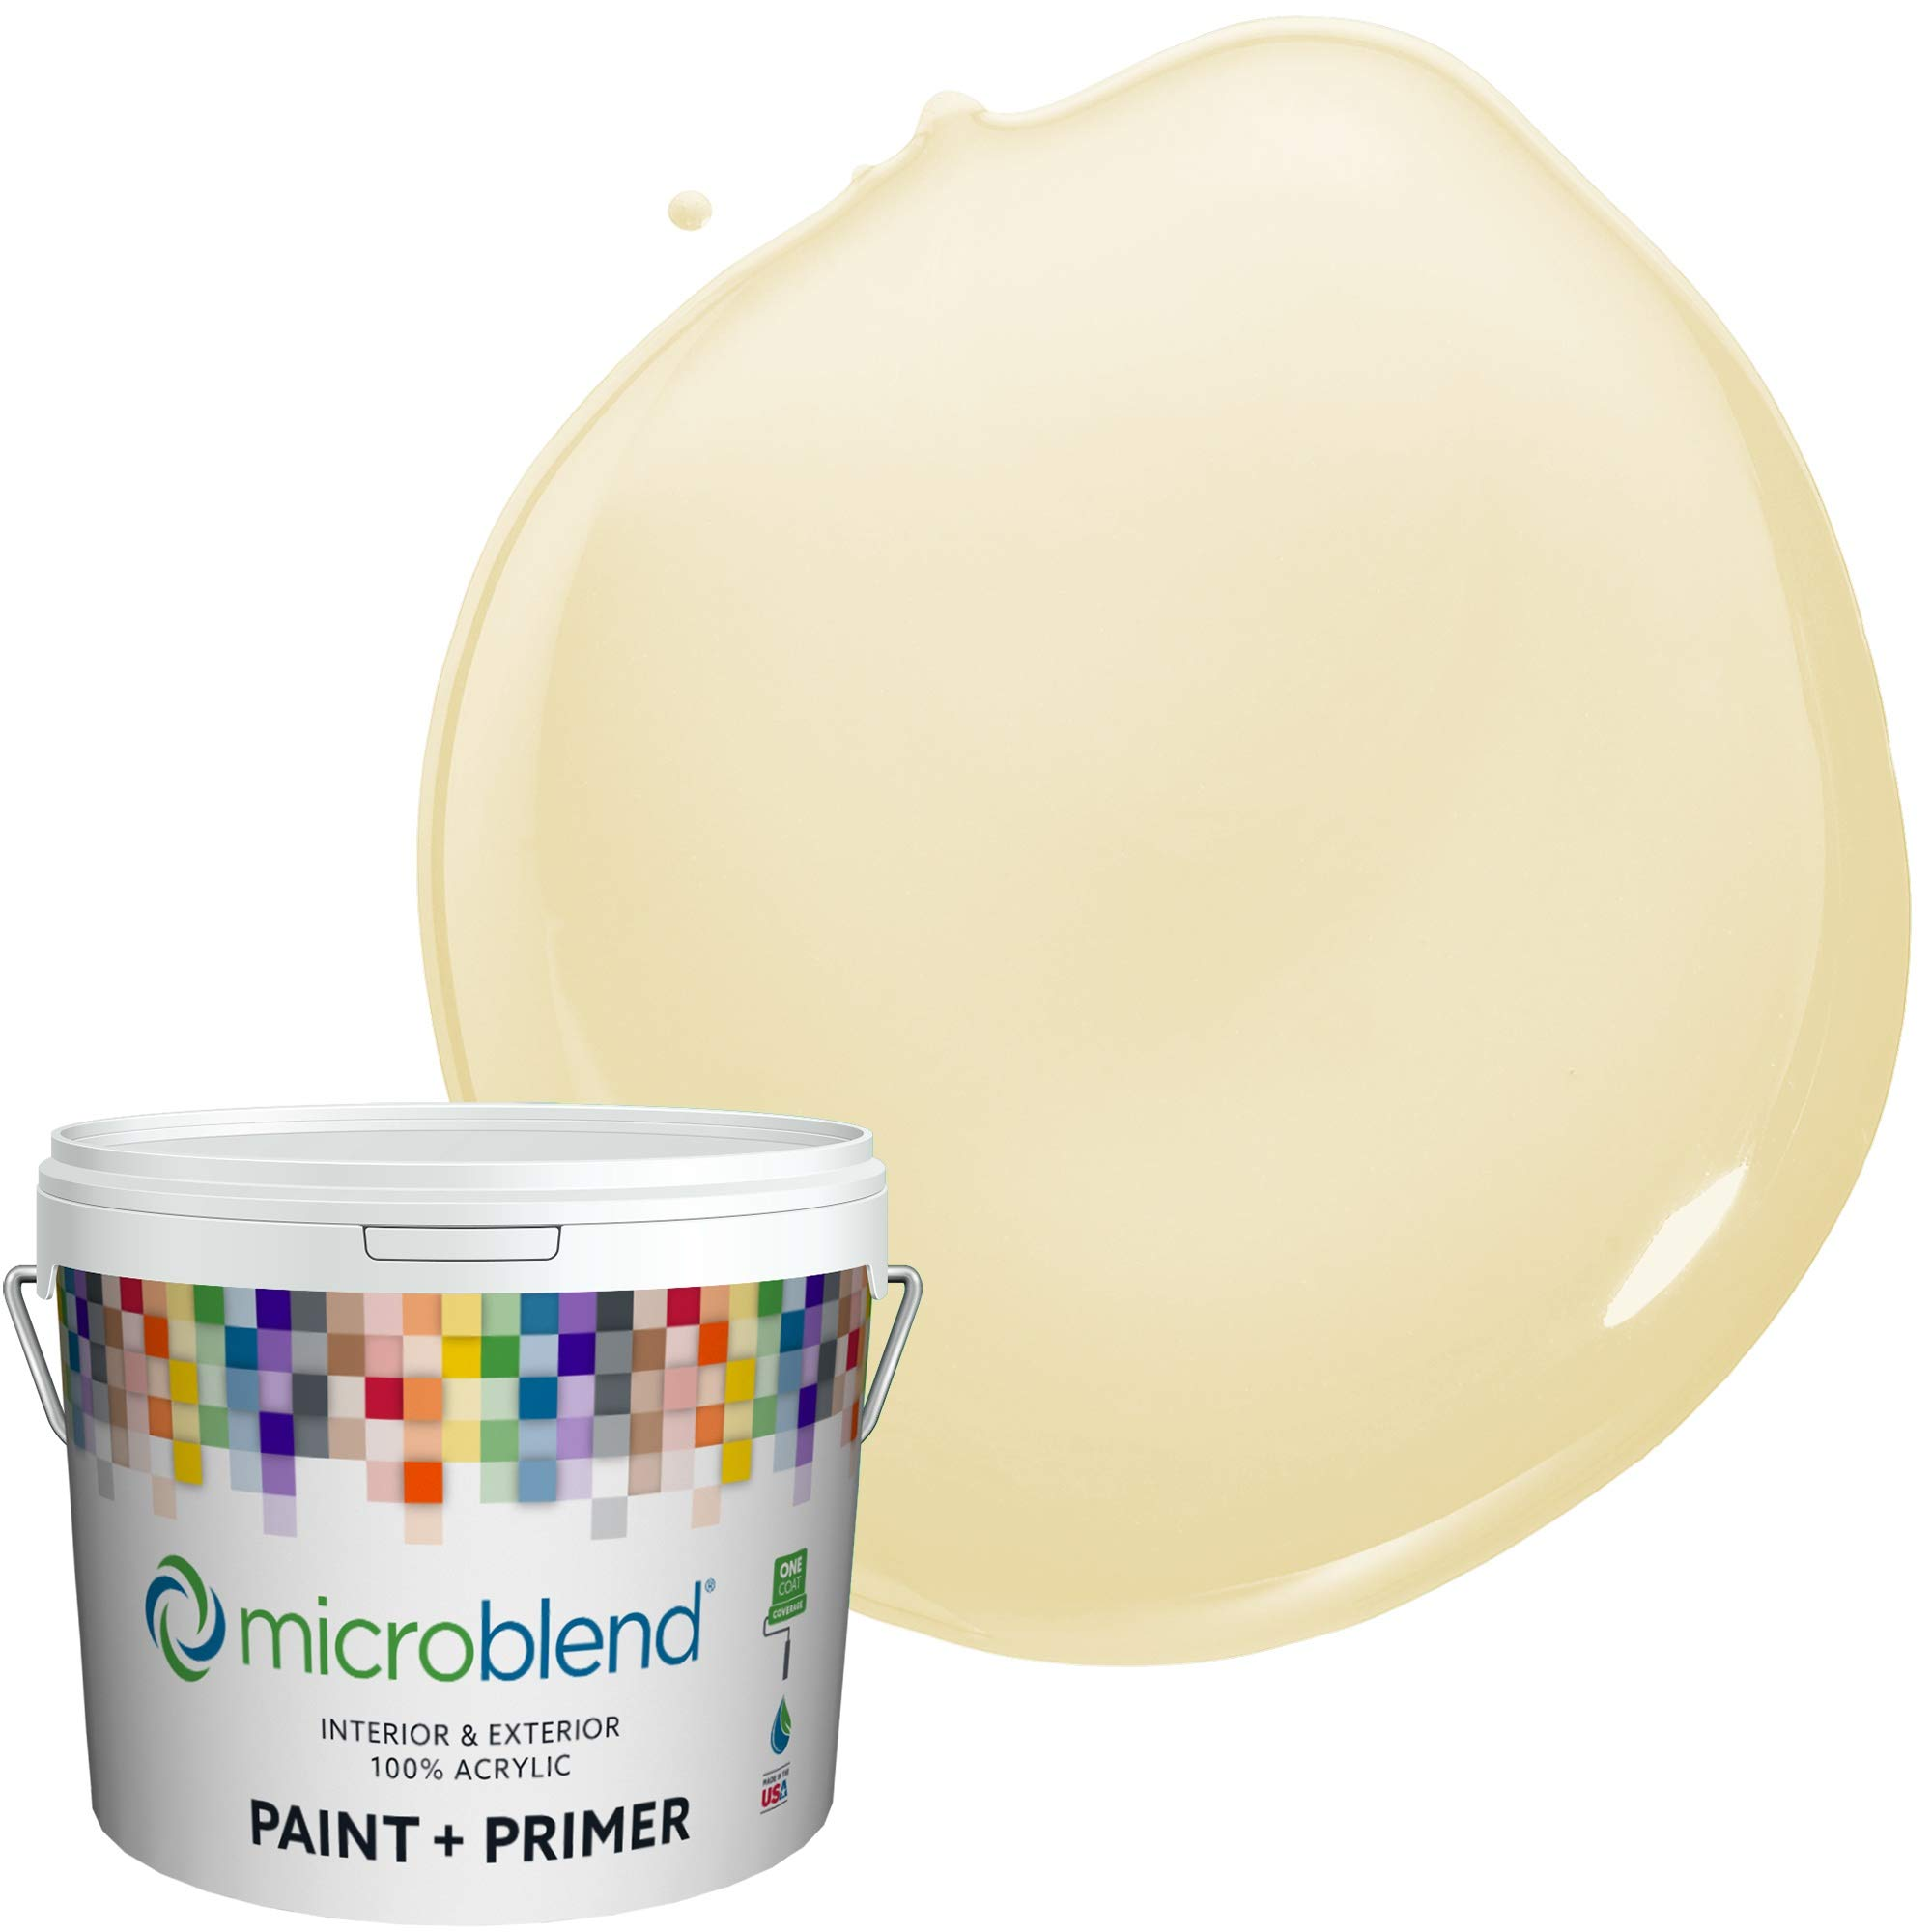 Microblend Interior Paint + Primer, Sunshine Mist, Eggshell Sheen, 1 Gallon, Custom Made, Premium Quality One Coat Hide & Washable Paint (73220-2-M0888B2(C))